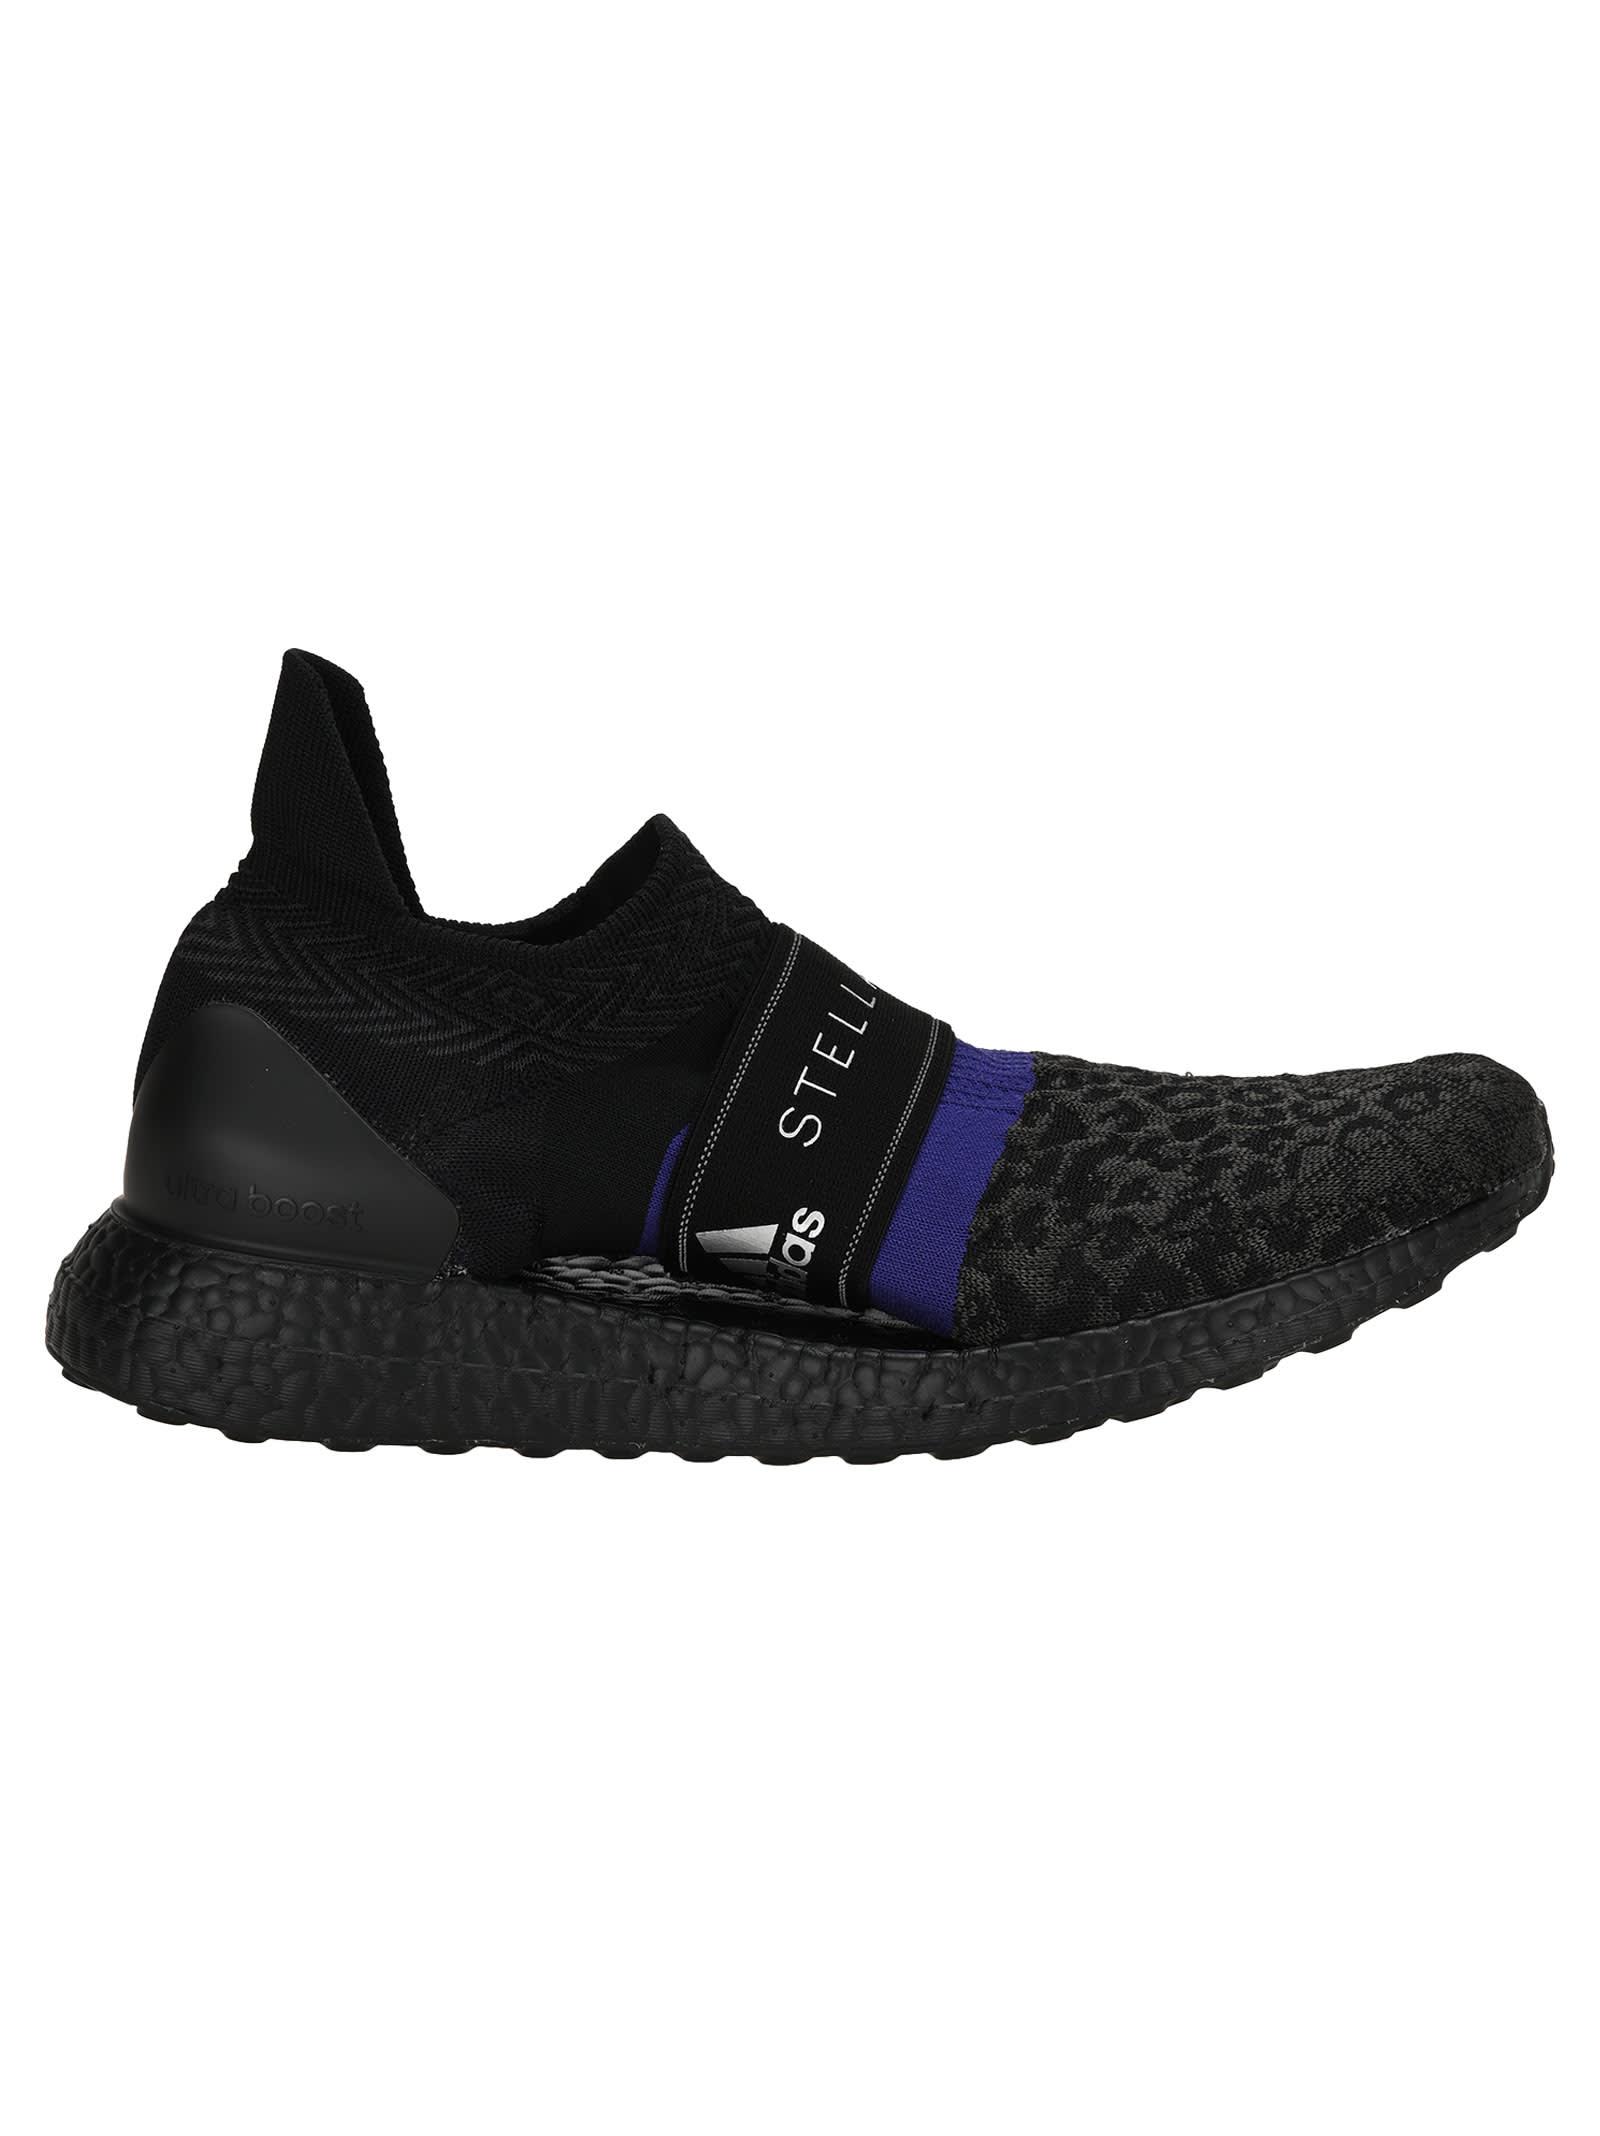 Adidas By Stella Mccartney ADIDAS BY STELLA MCCARTNEY ULTRABOOST X 3D KNIT SNEAKERS